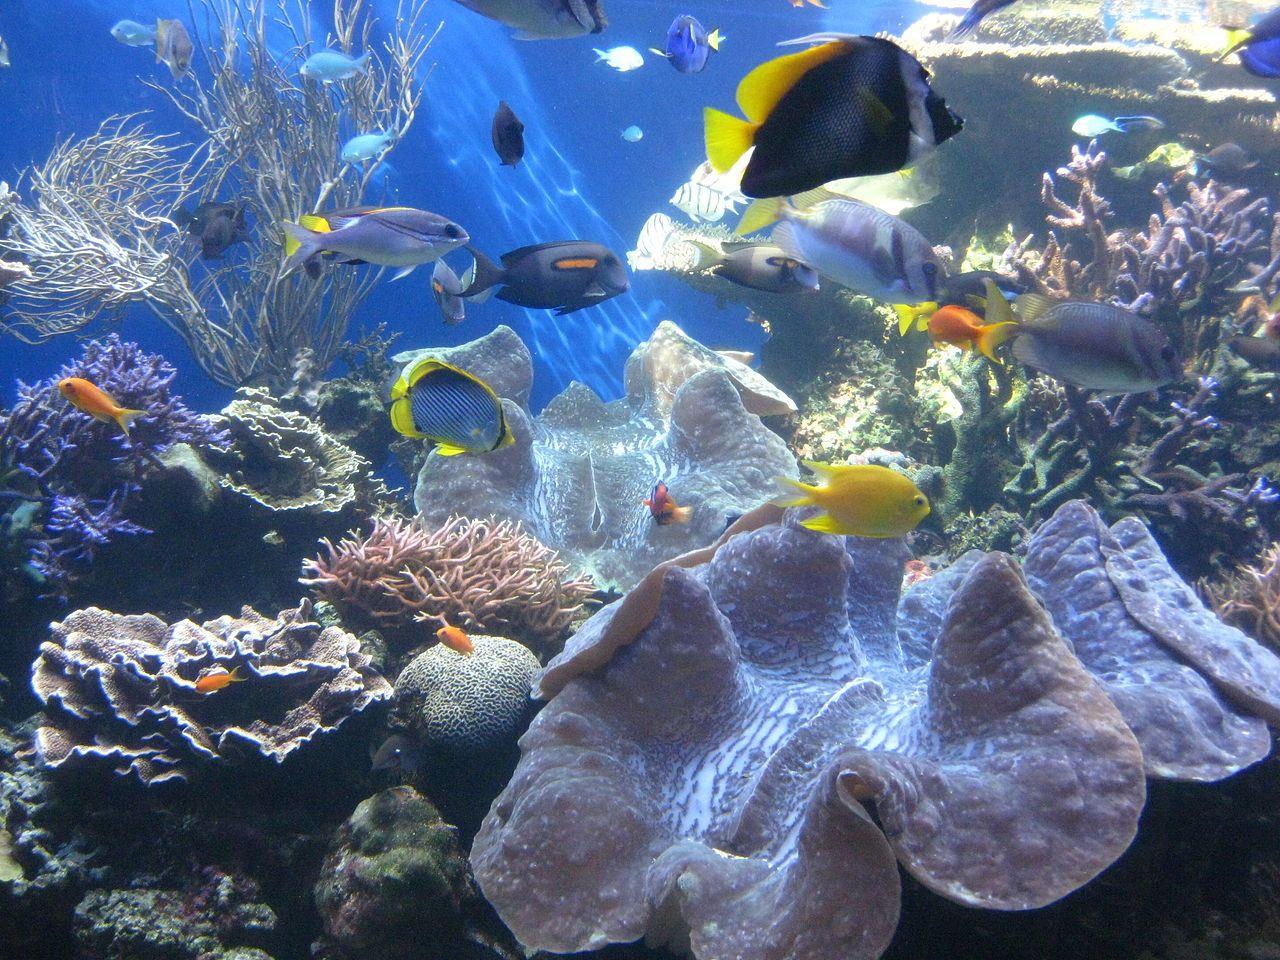 Pin by elizabeth hudson on fishaquariumwater related pinterest